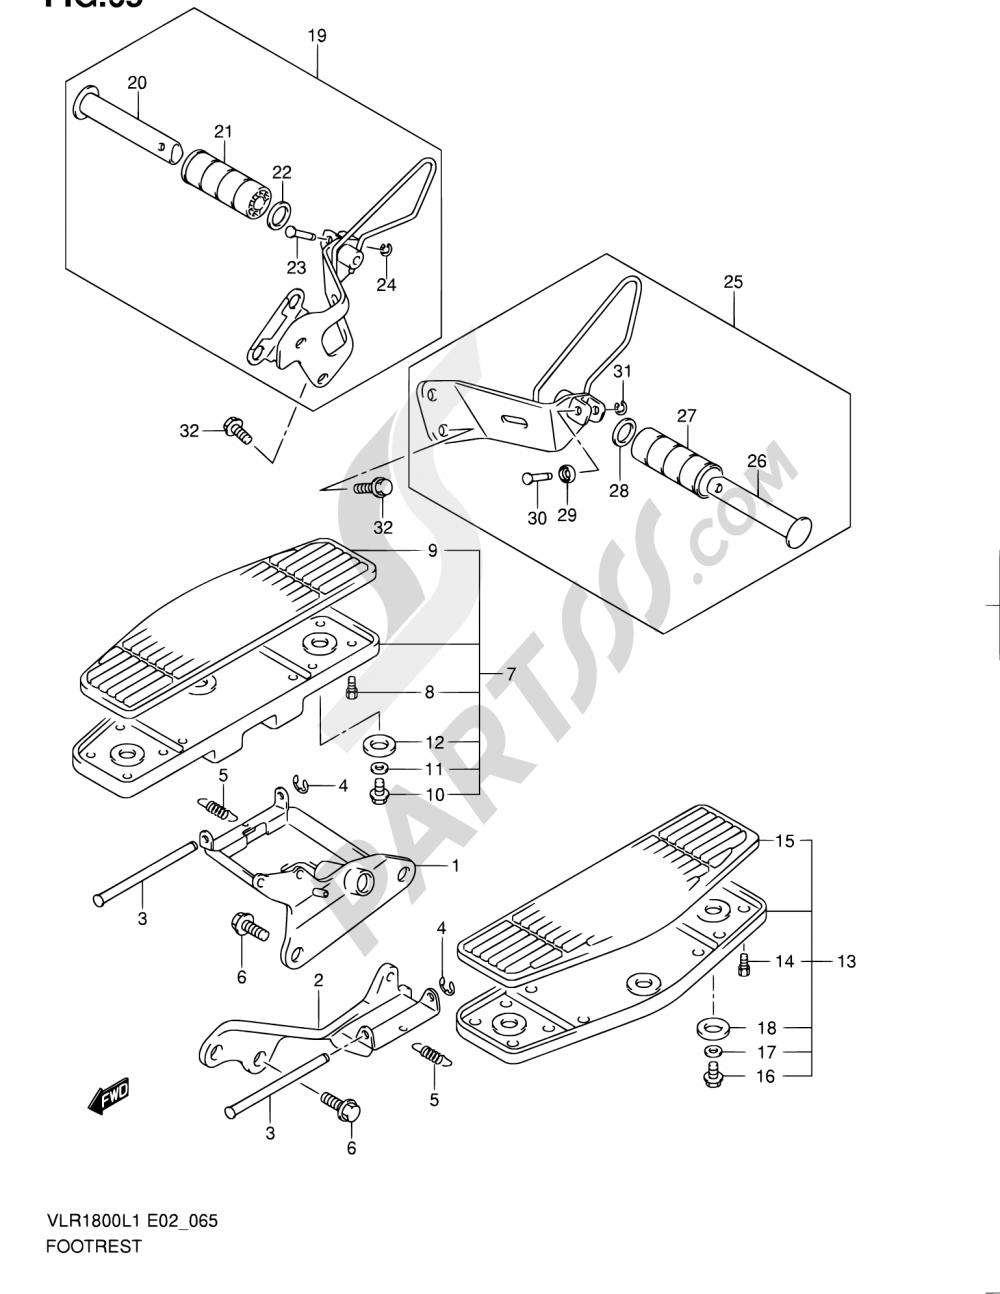 65 - FOOTREST (VLR1800L1 E02) Suzuki INTRUDER VLR1800T 2011